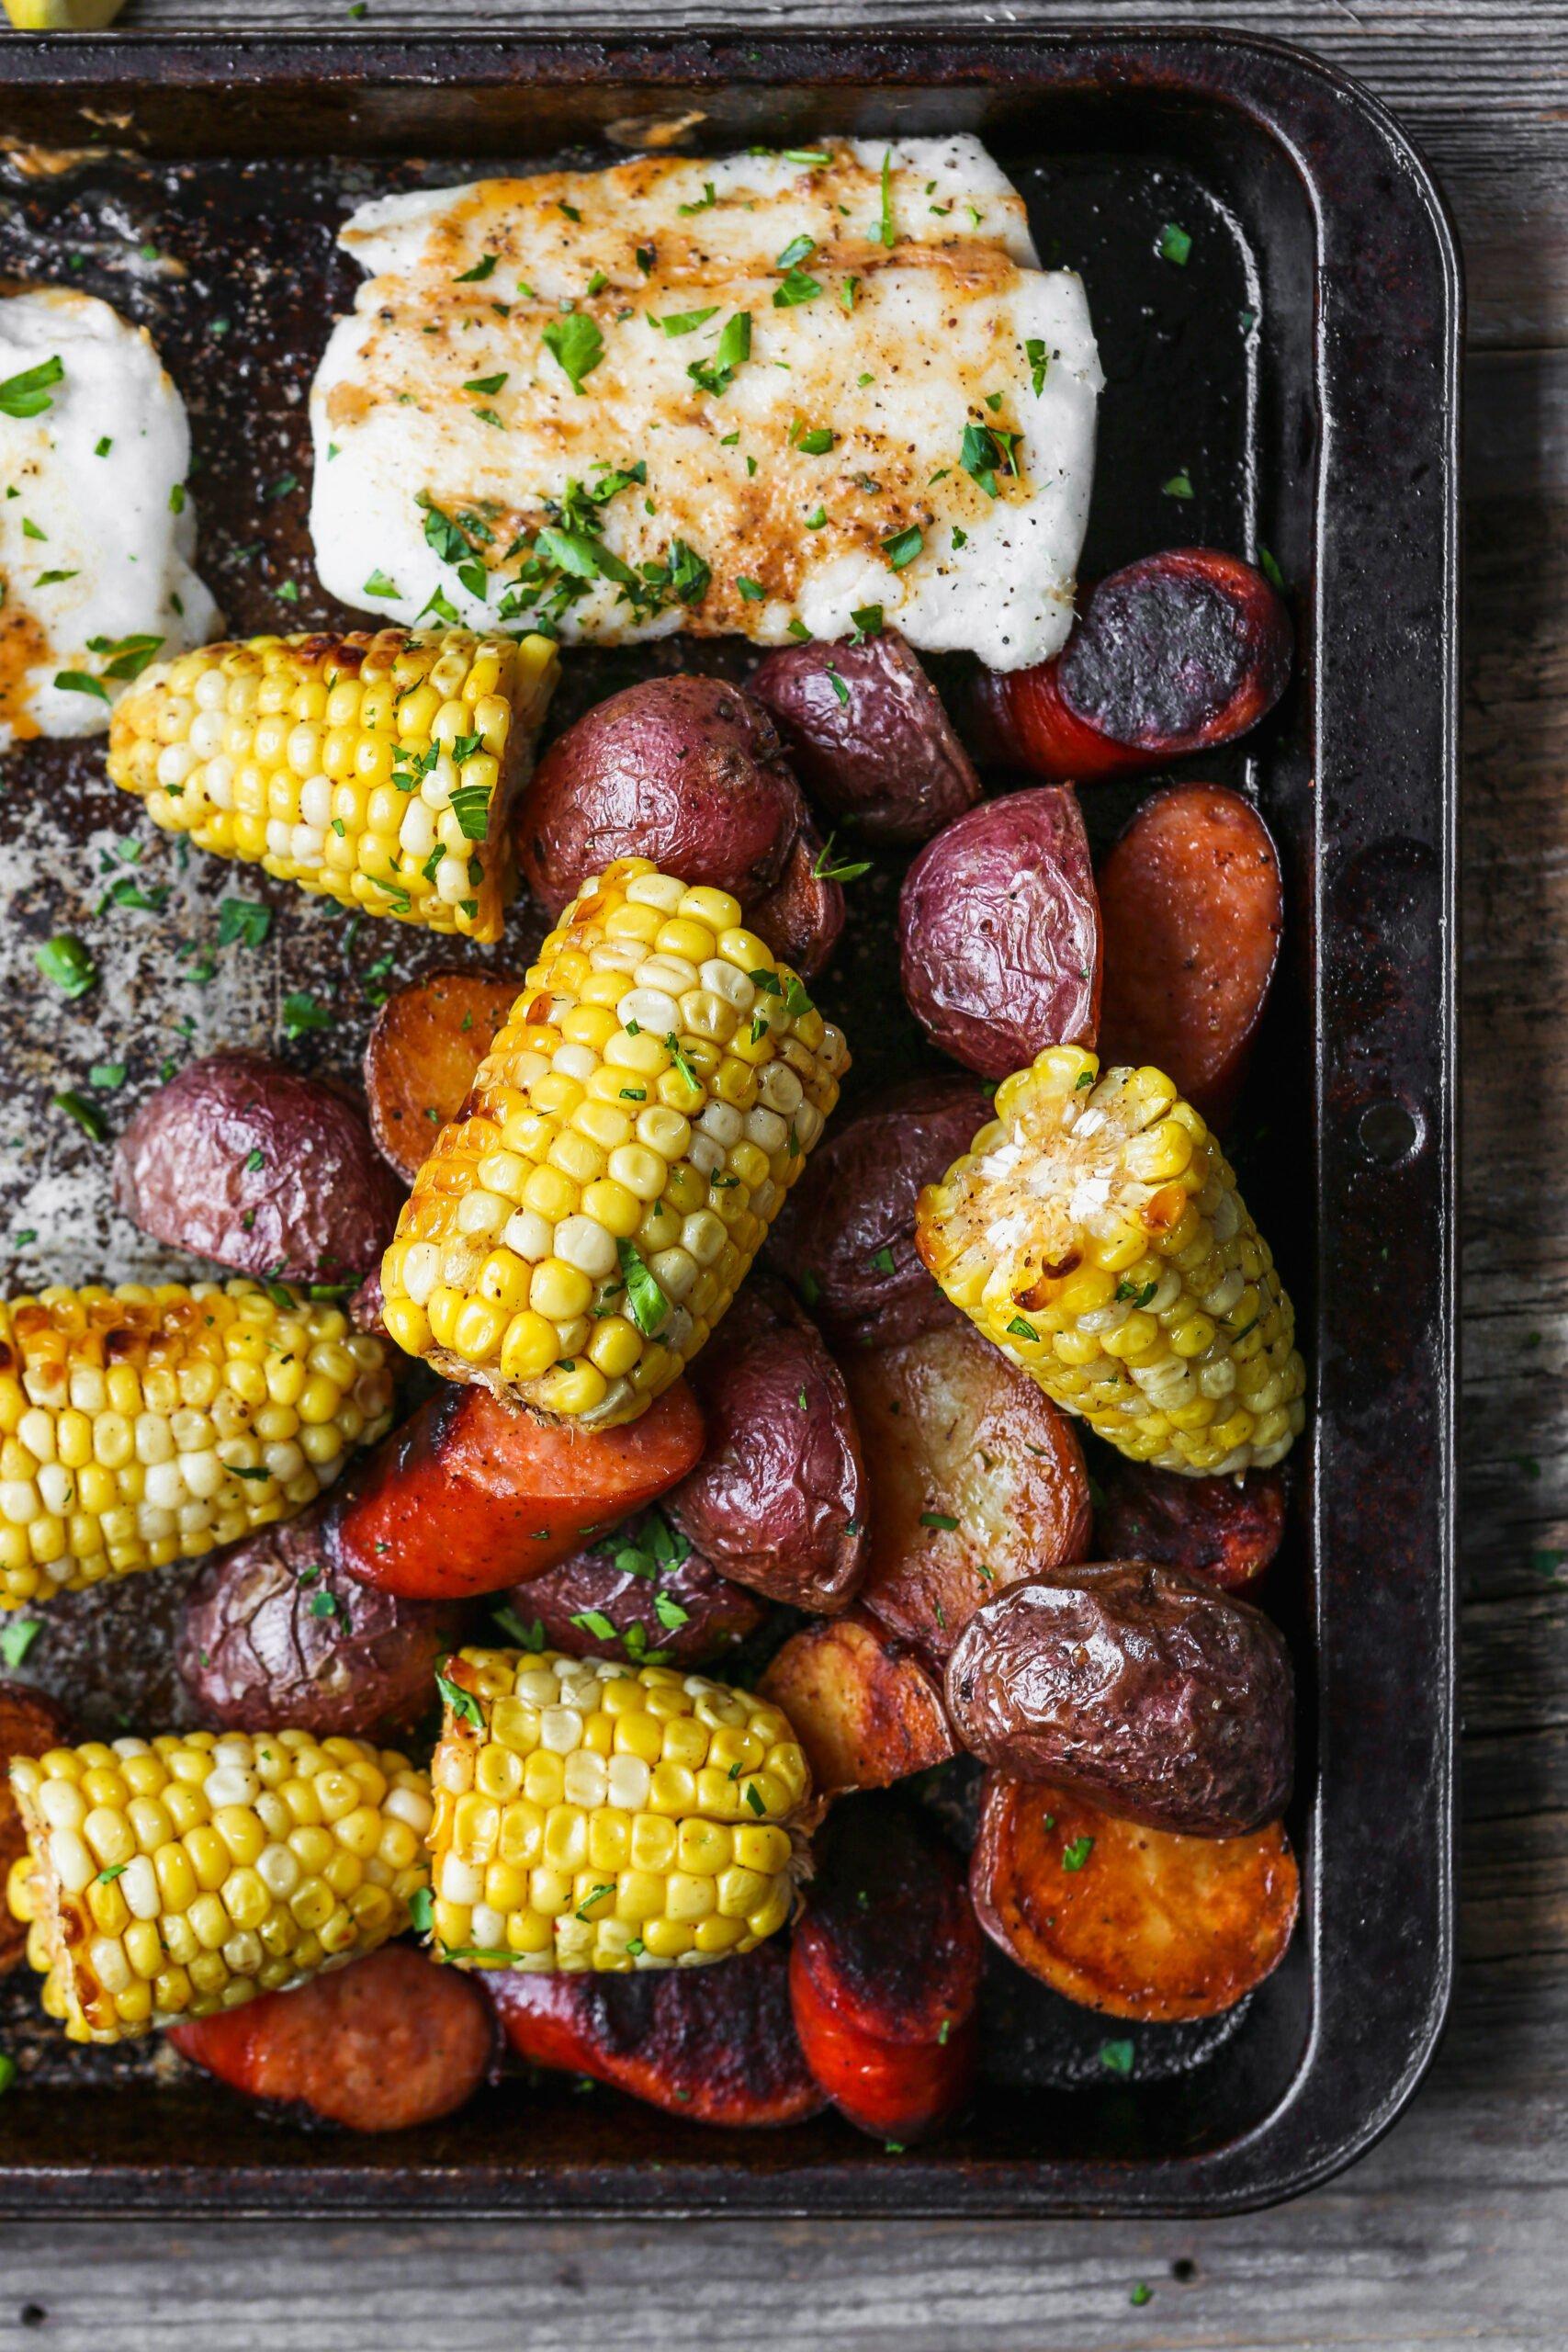 Roasted fish, potatoes, sausage, and corn on worn baking sheet.